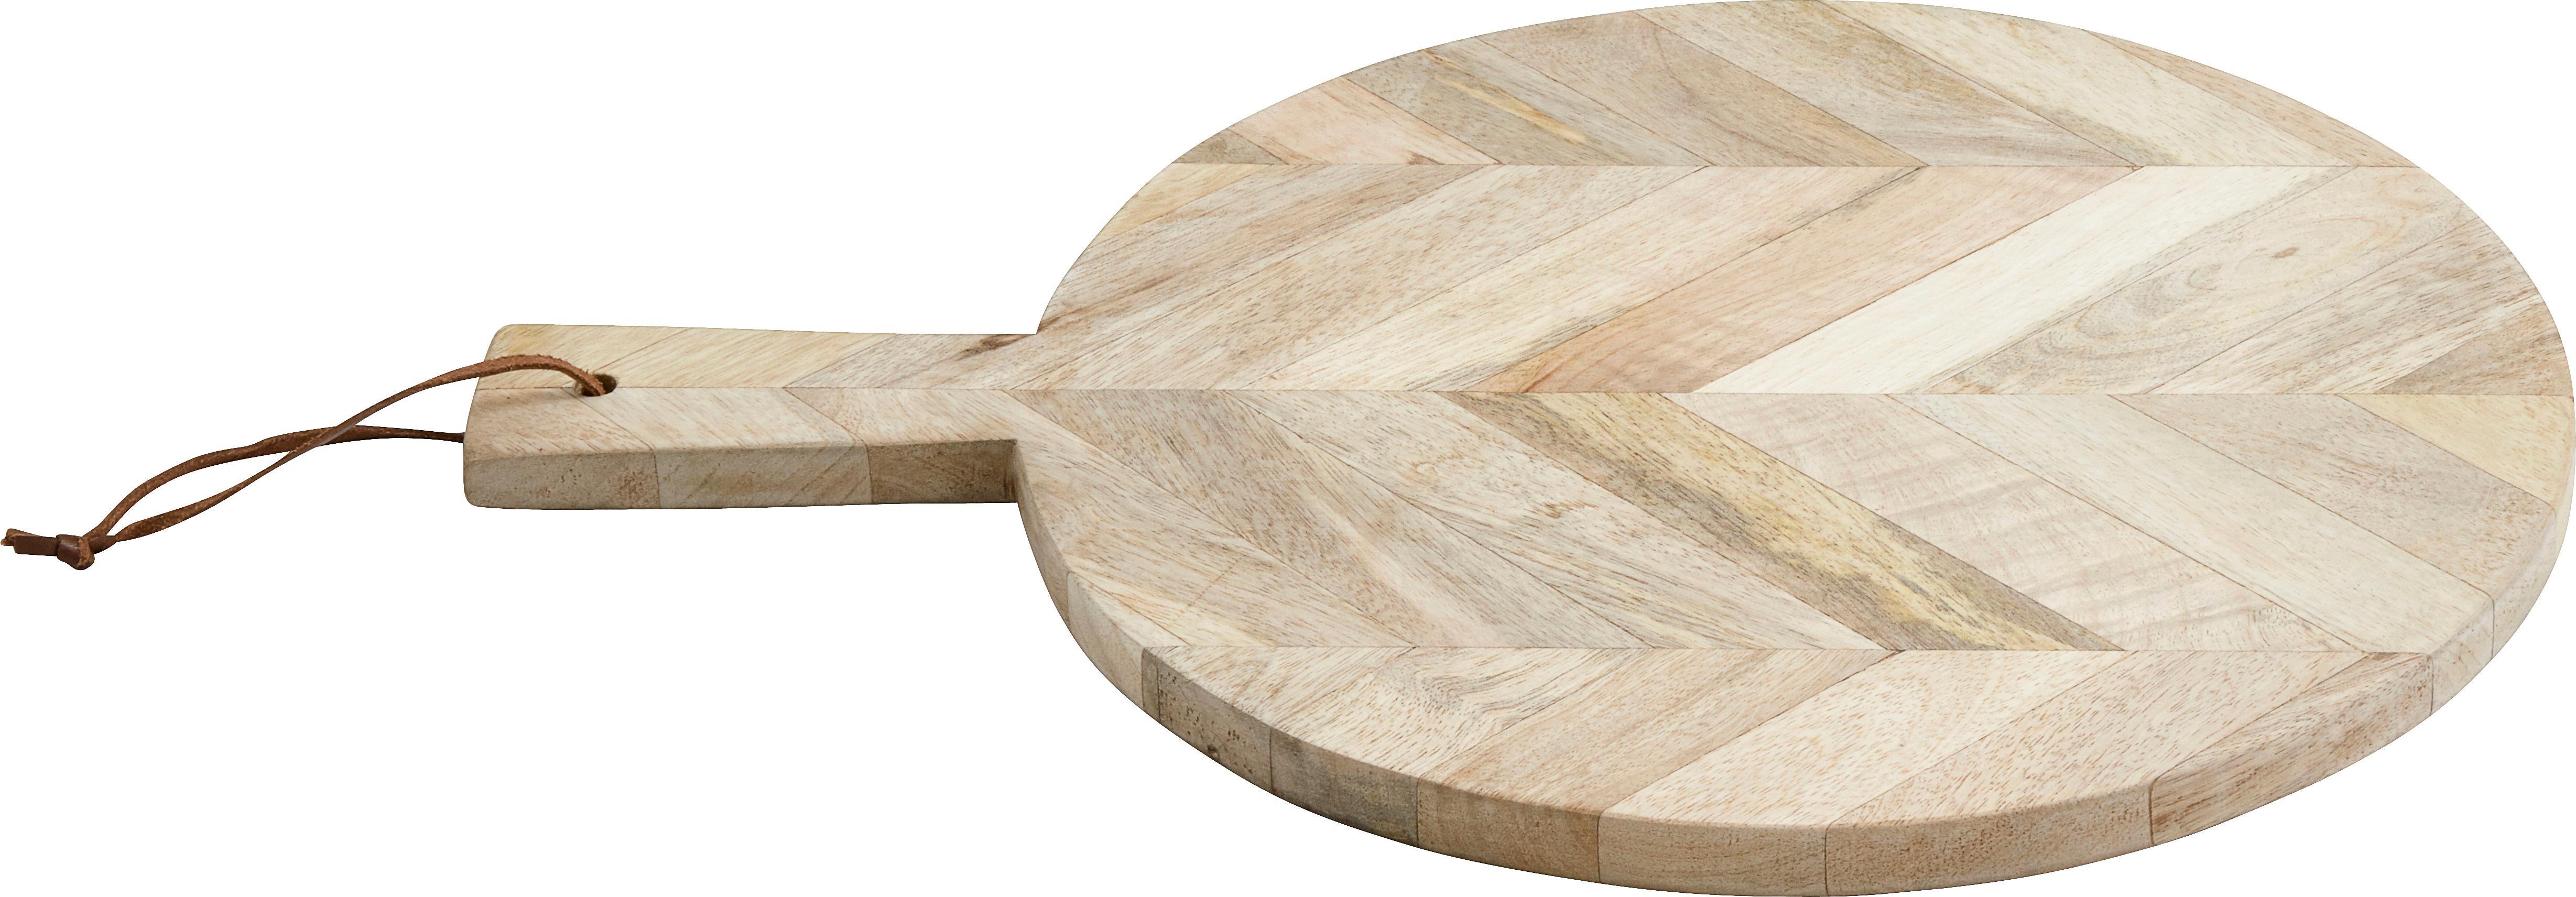 Tabla de cortar Herringbone, Madera de mango, cuero, Madera de mango, An 43 x F 32 cm